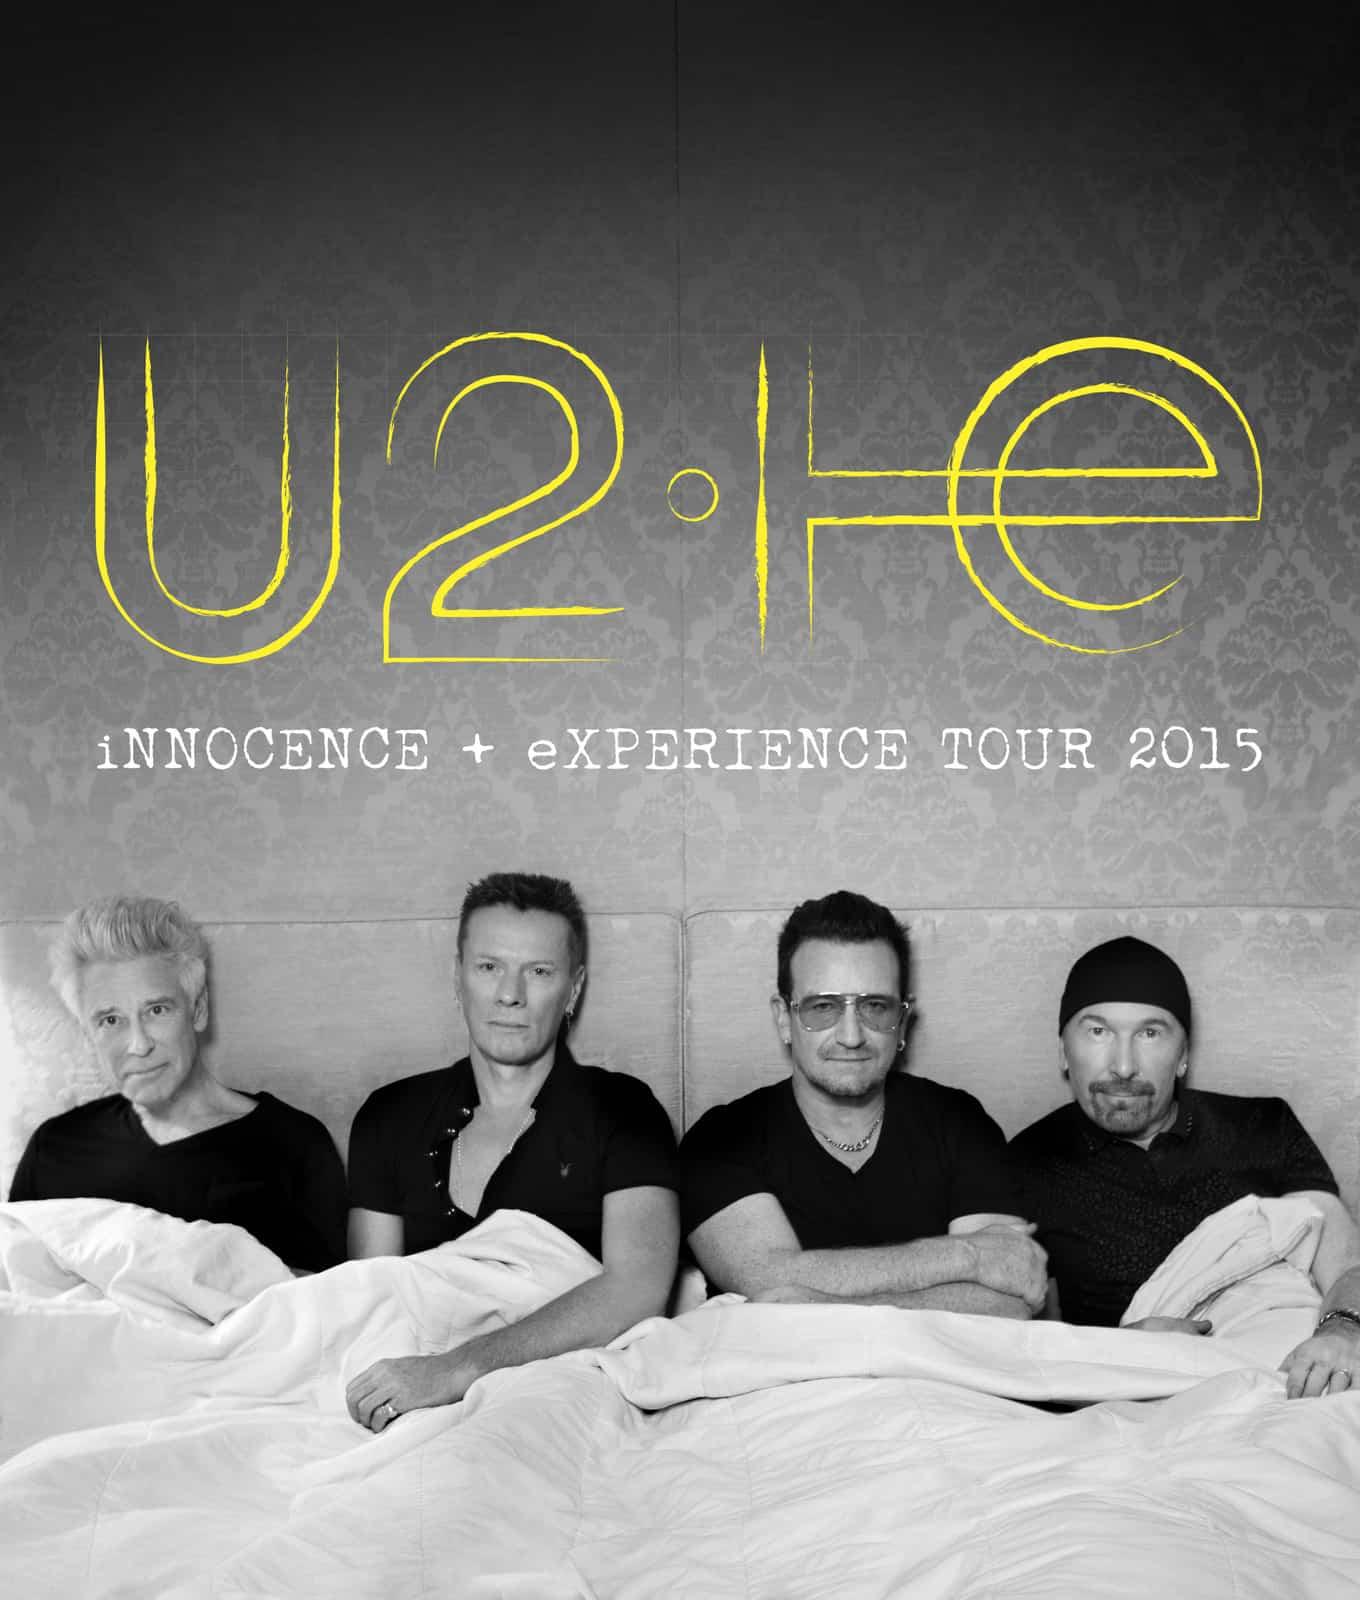 Ed Sheeran Tour Dates 2015.U2 Announce 2015 Tour Dates